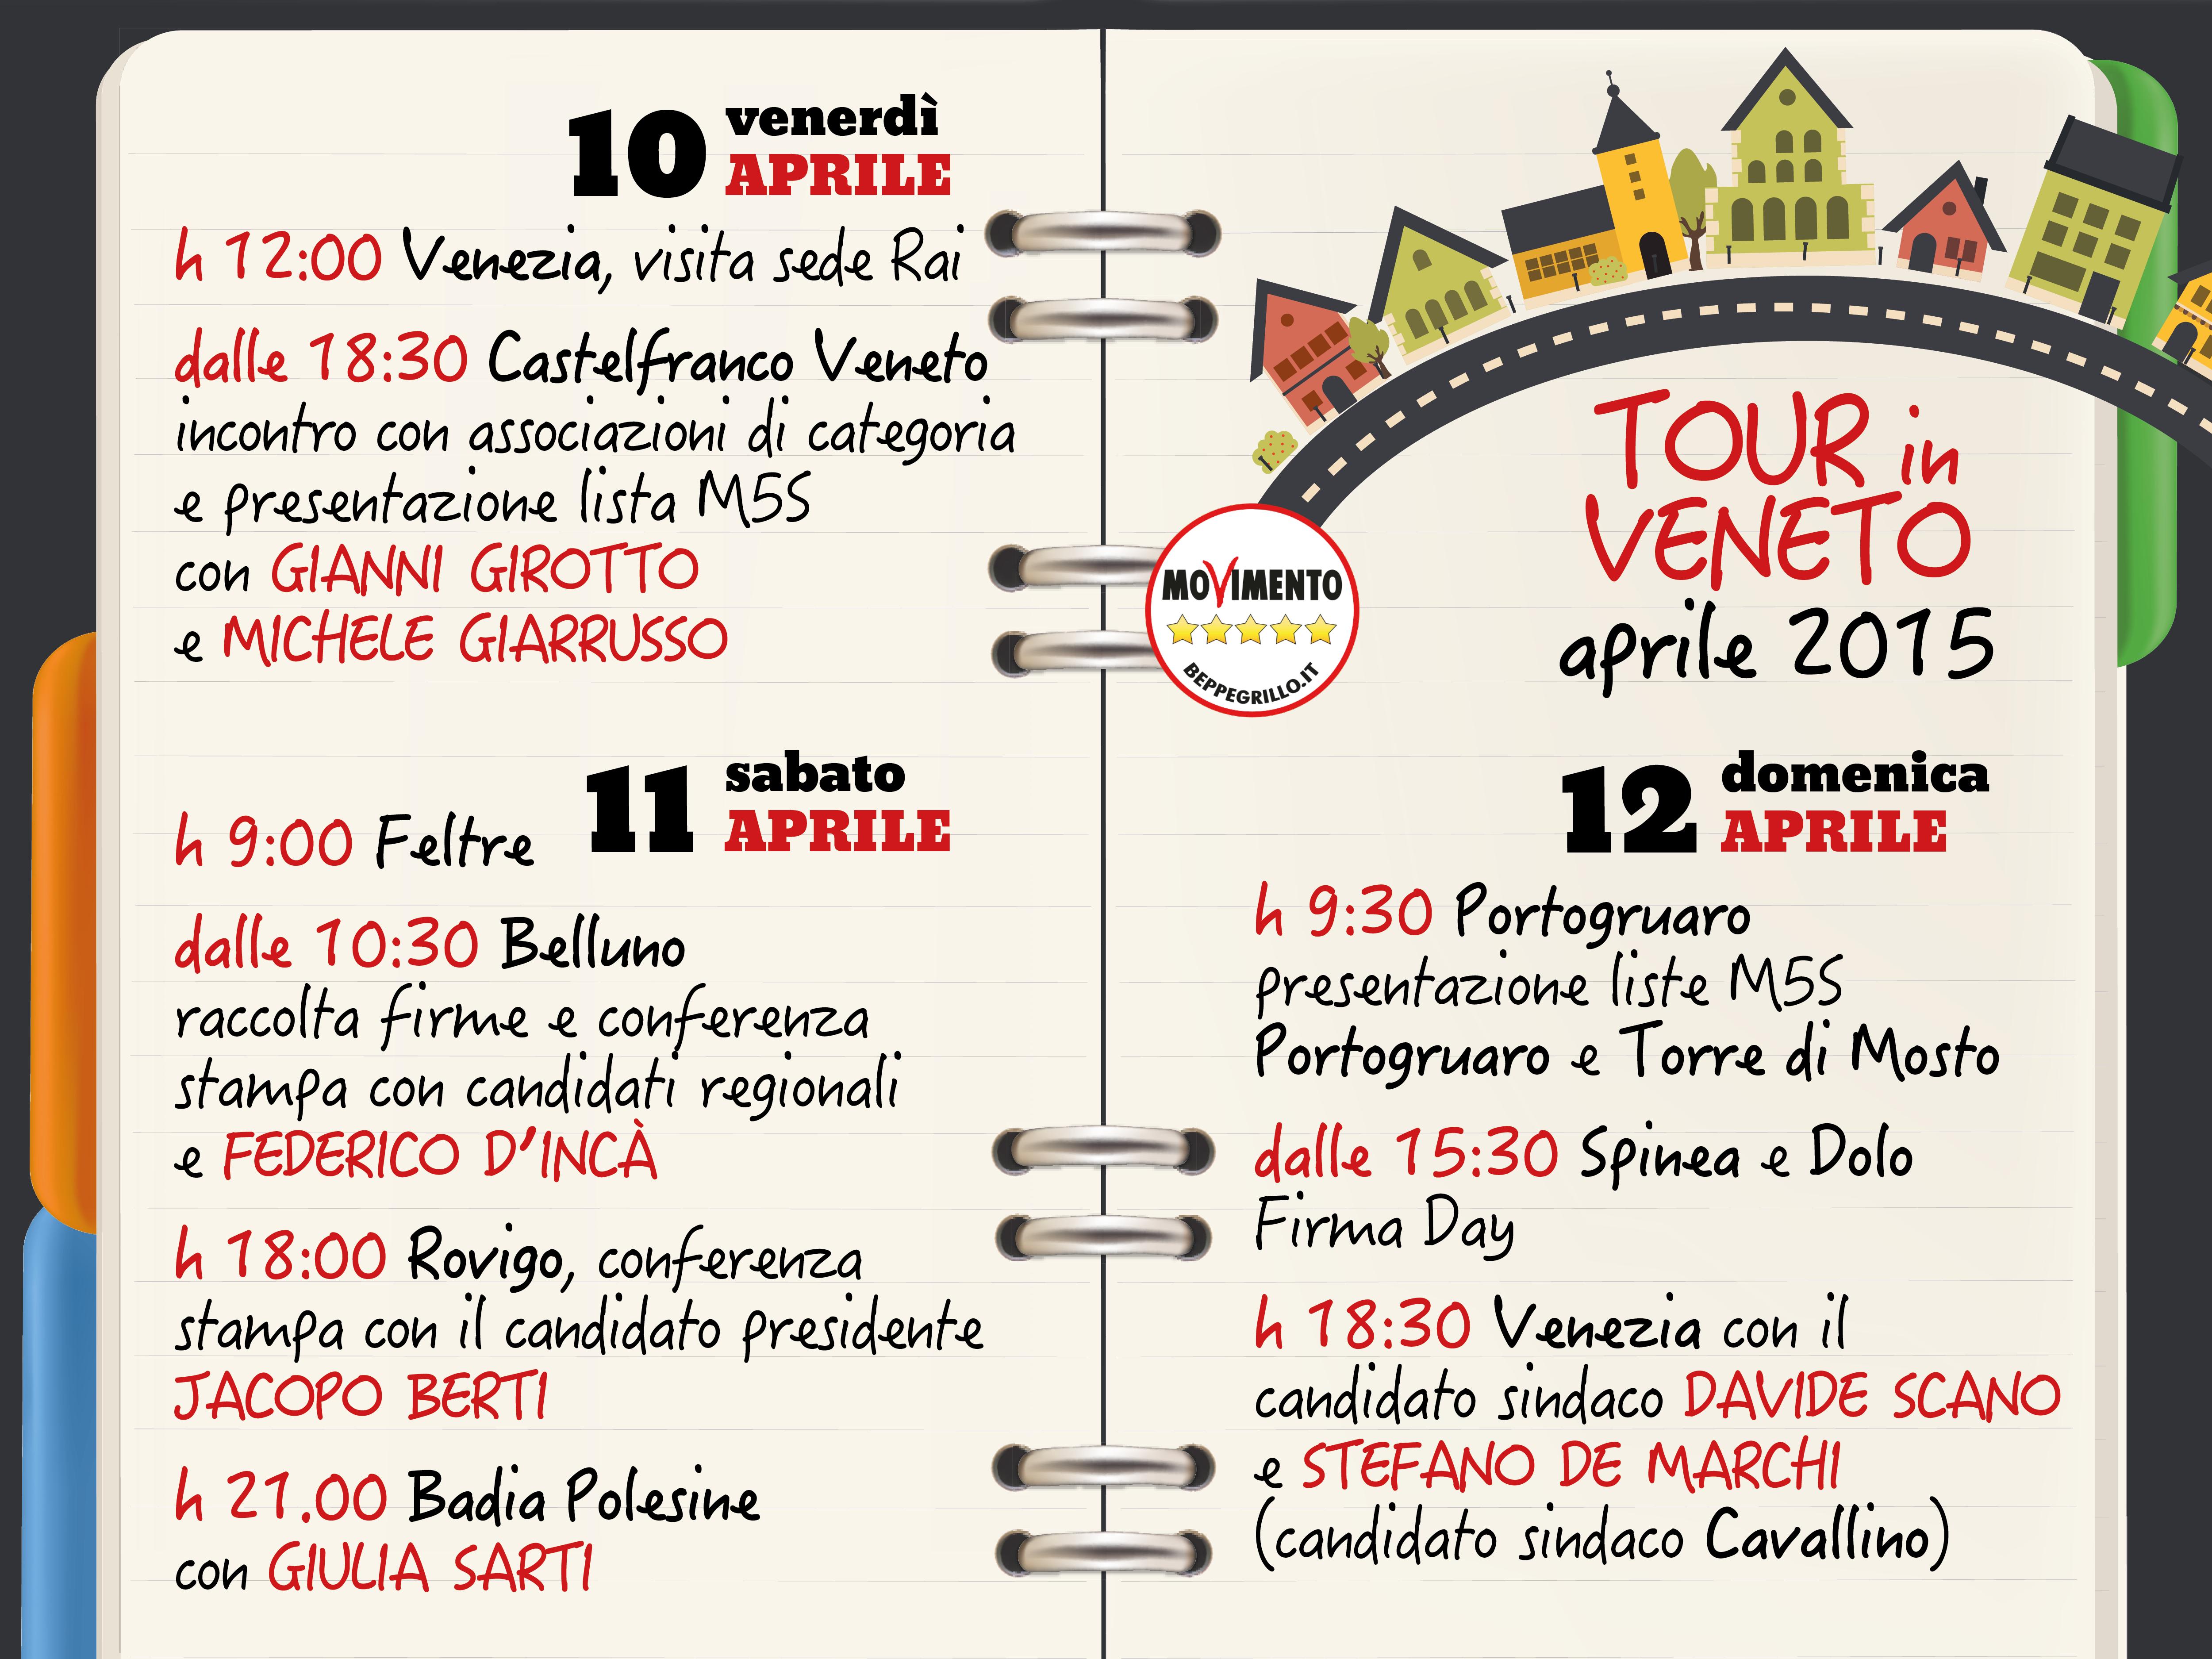 agenda_tour_veneto_2